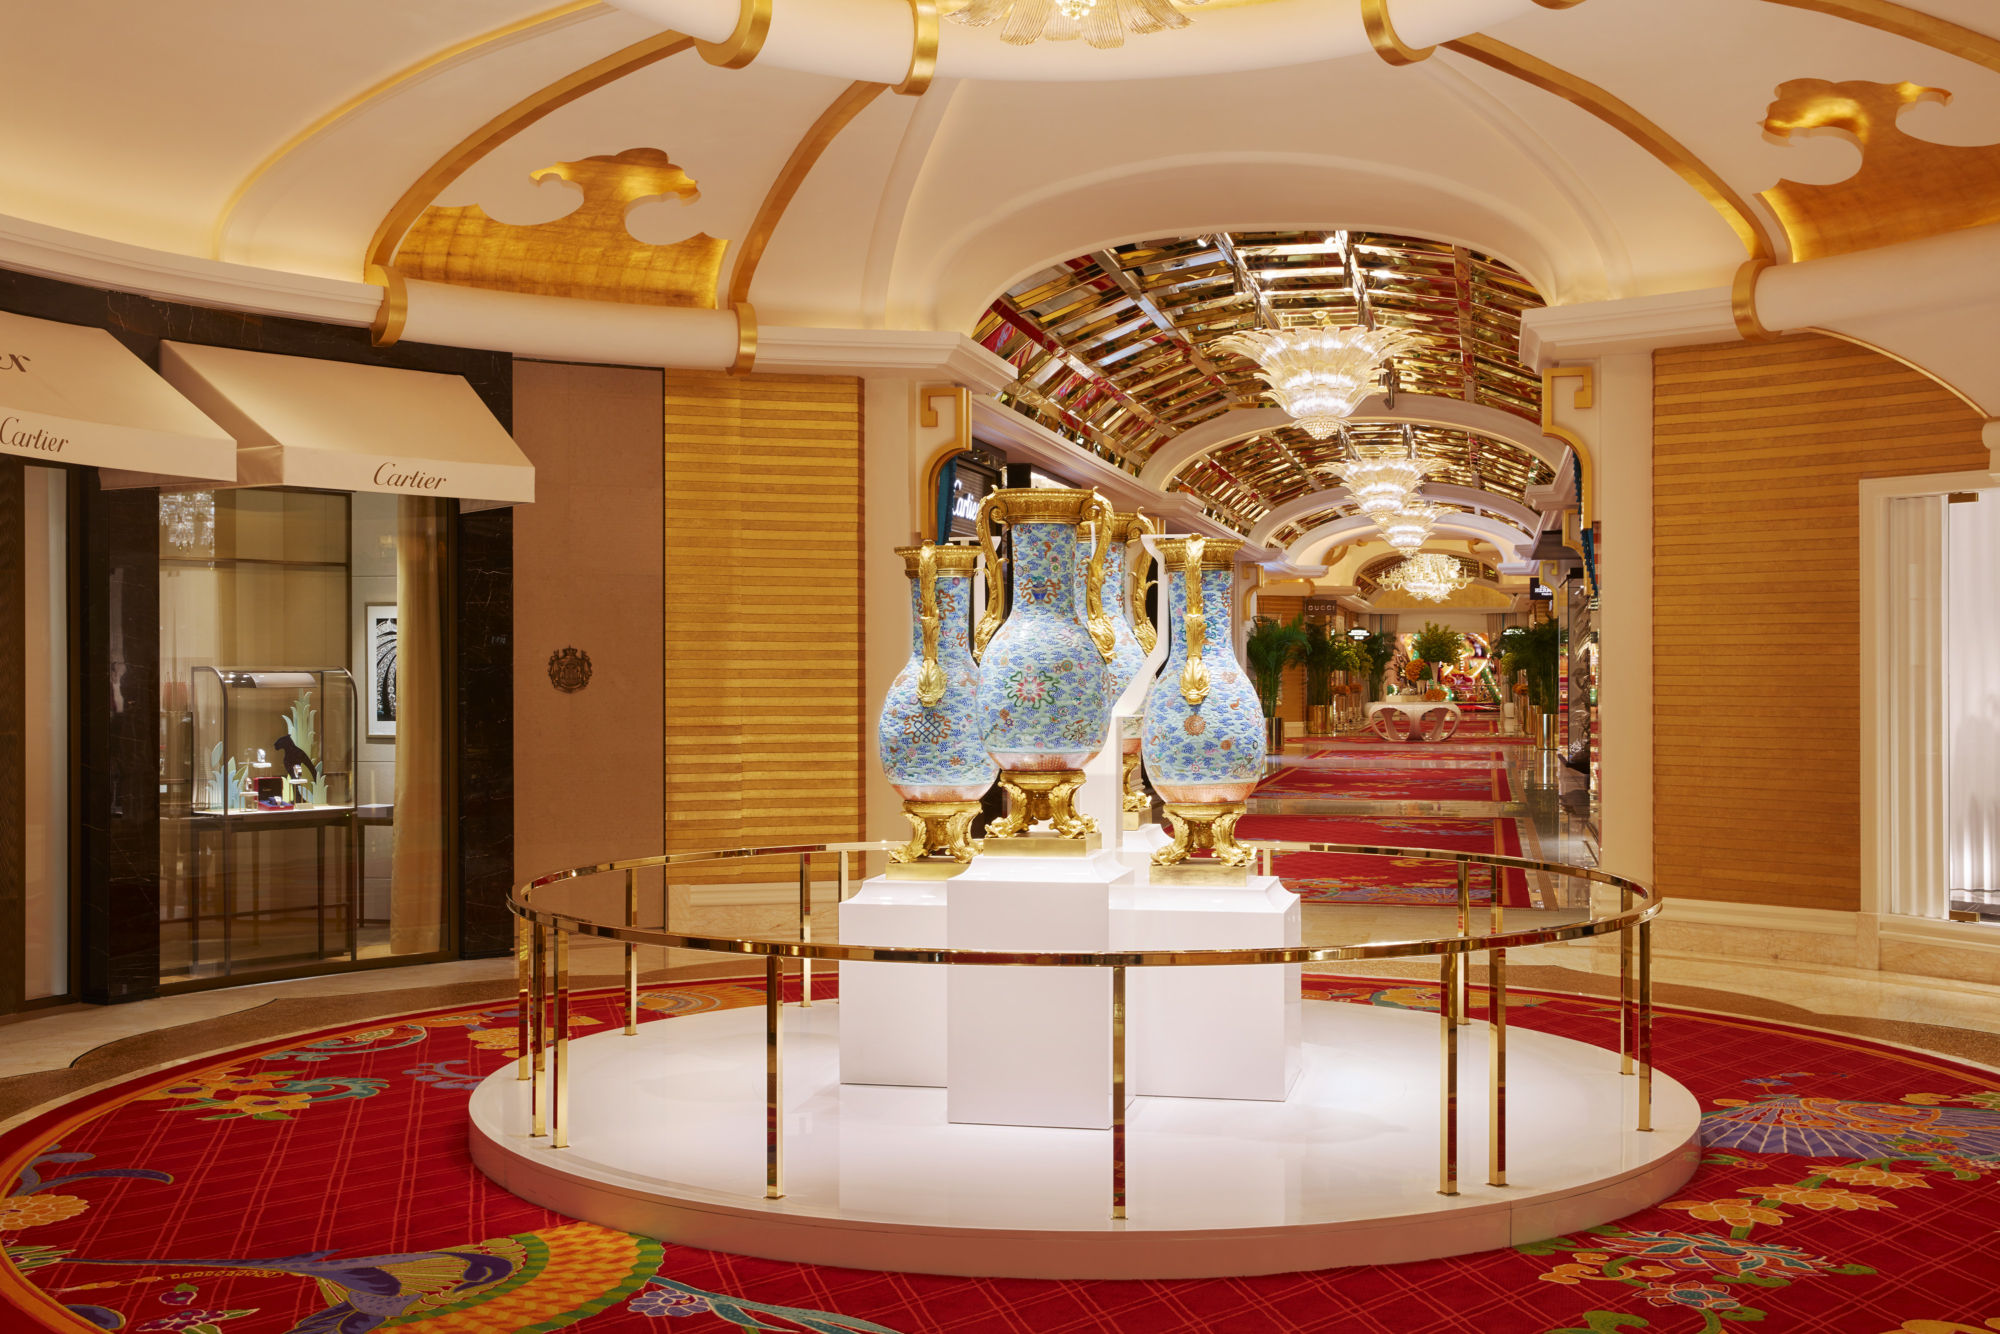 Buccleuch Vases Wynn palace art Macau art guide